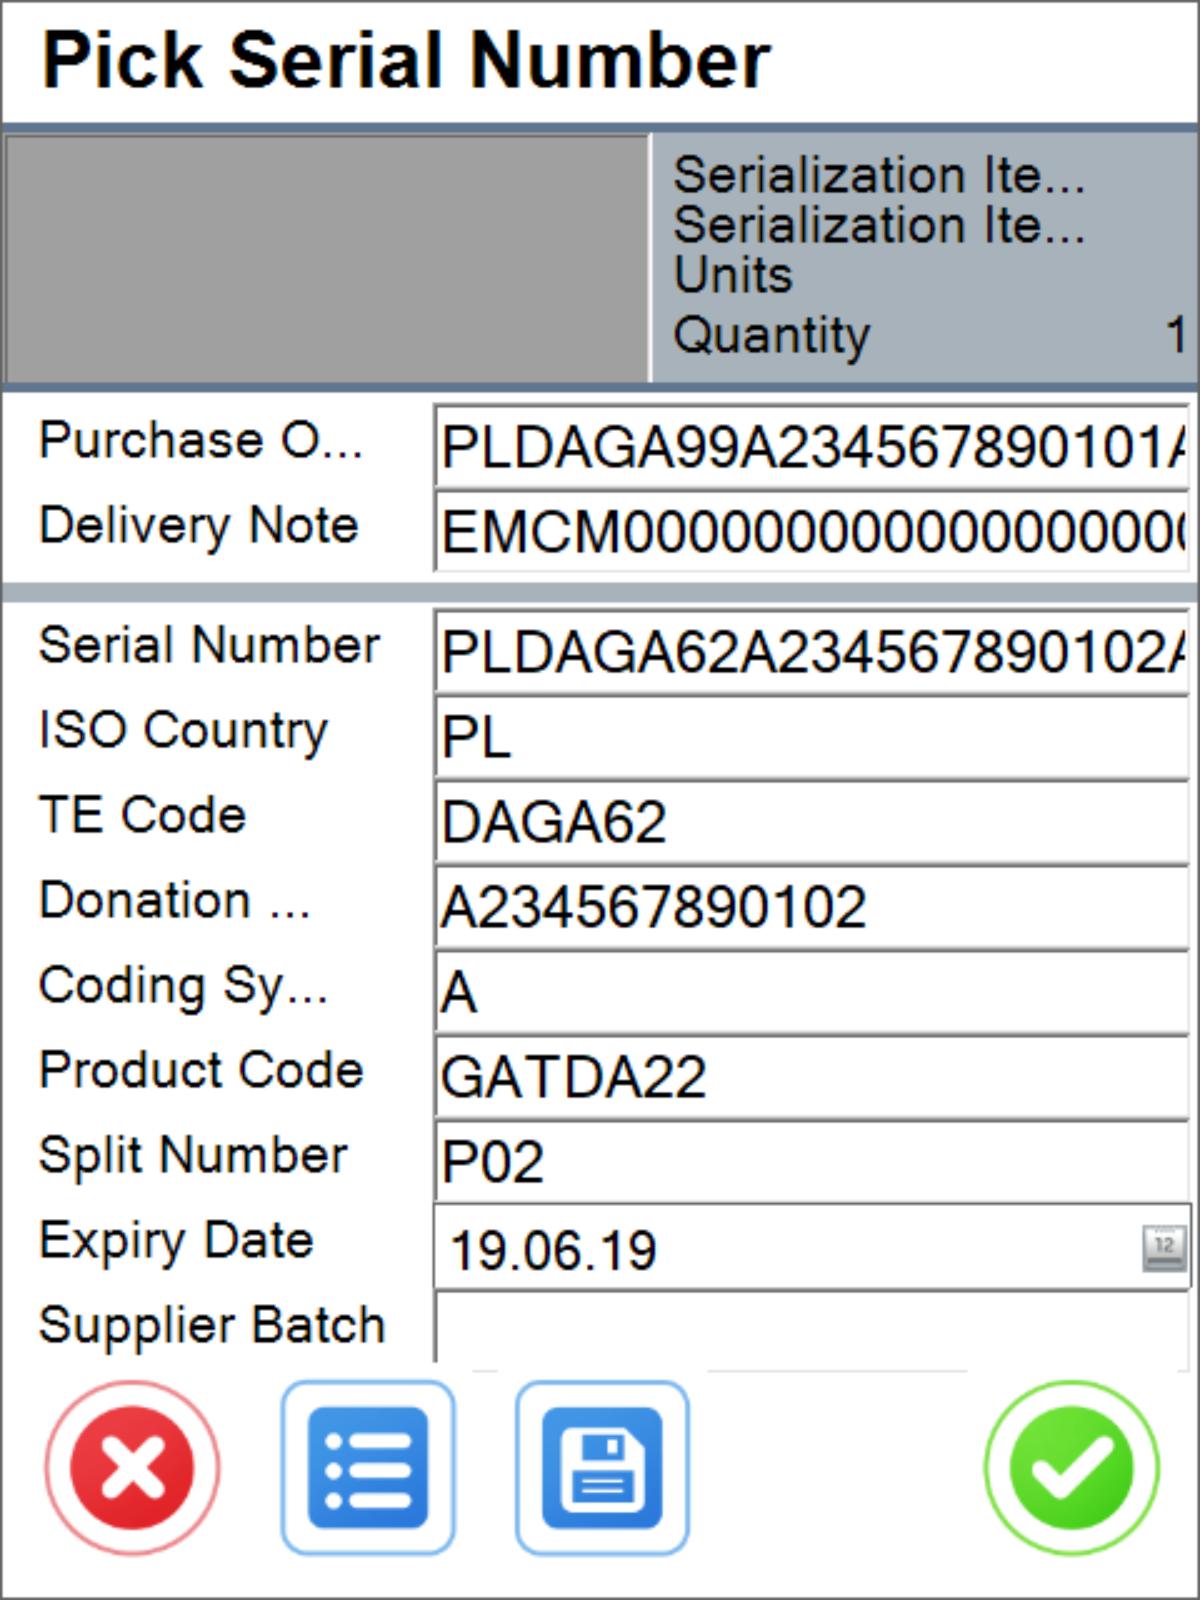 Pick Serial Number